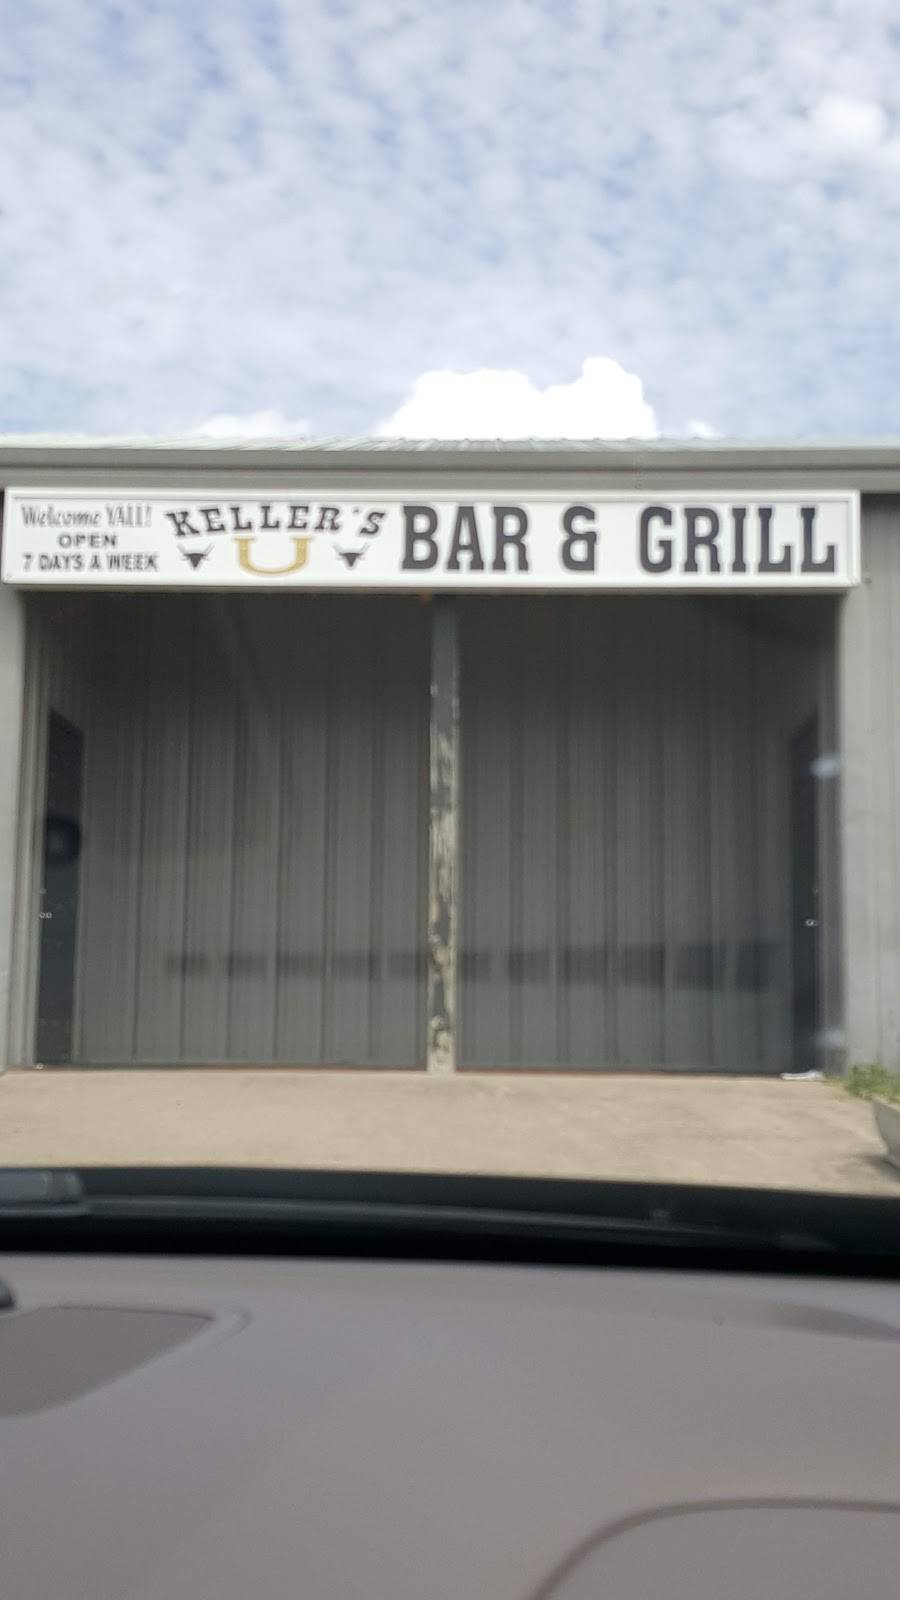 Kellers Bar & Grill   restaurant   A085029 00204 00006029, Bethpage, TN 37022, USA   6153749680 OR +1 615-374-9680